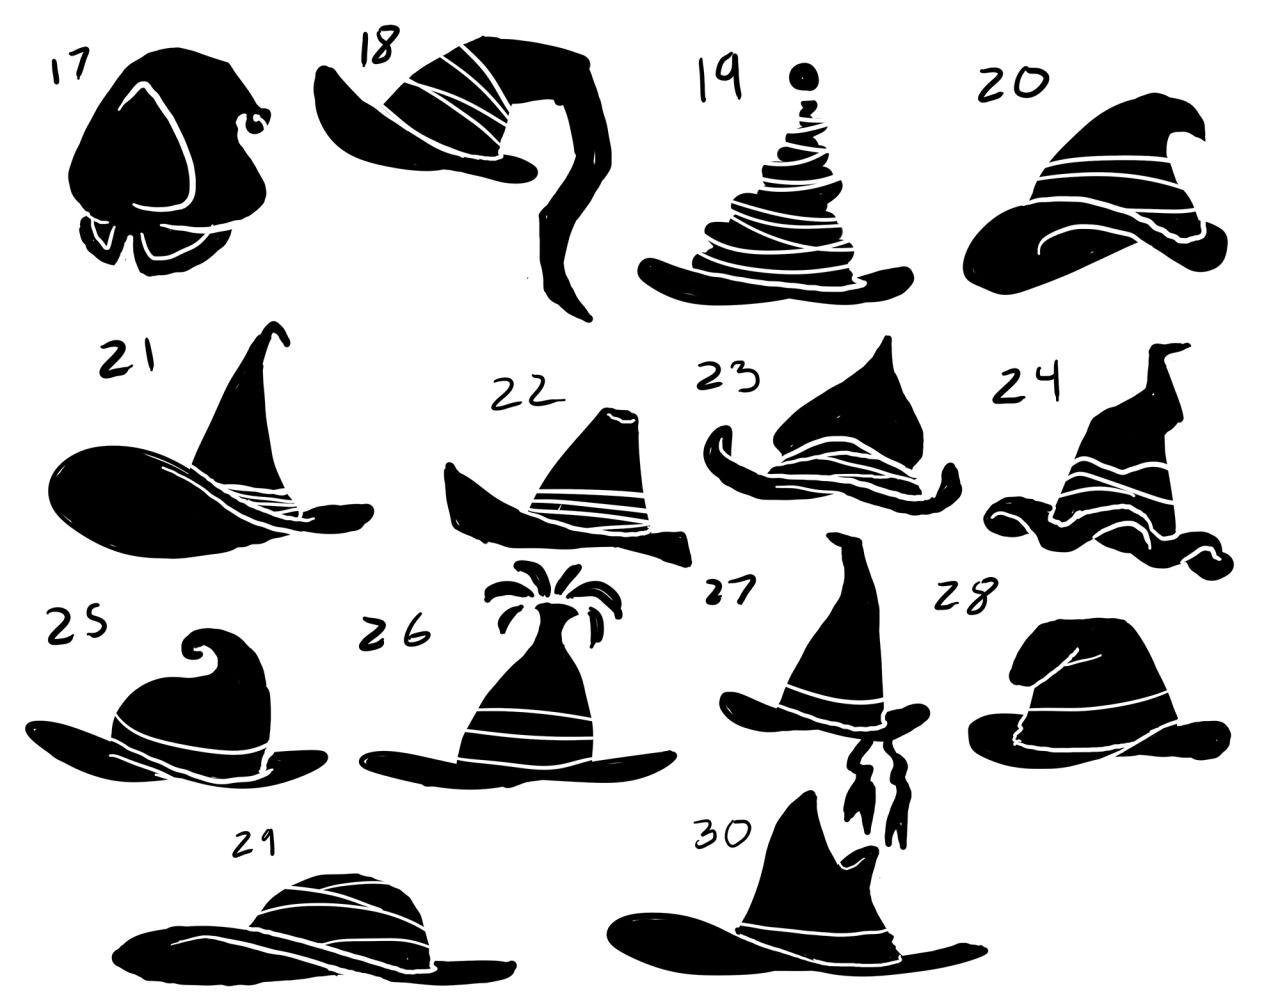 Eri Kawakami More Silhouettes For A Total Of 491 Yeesh So Witch Drawing Hat Drawing Witch Drawing Reference